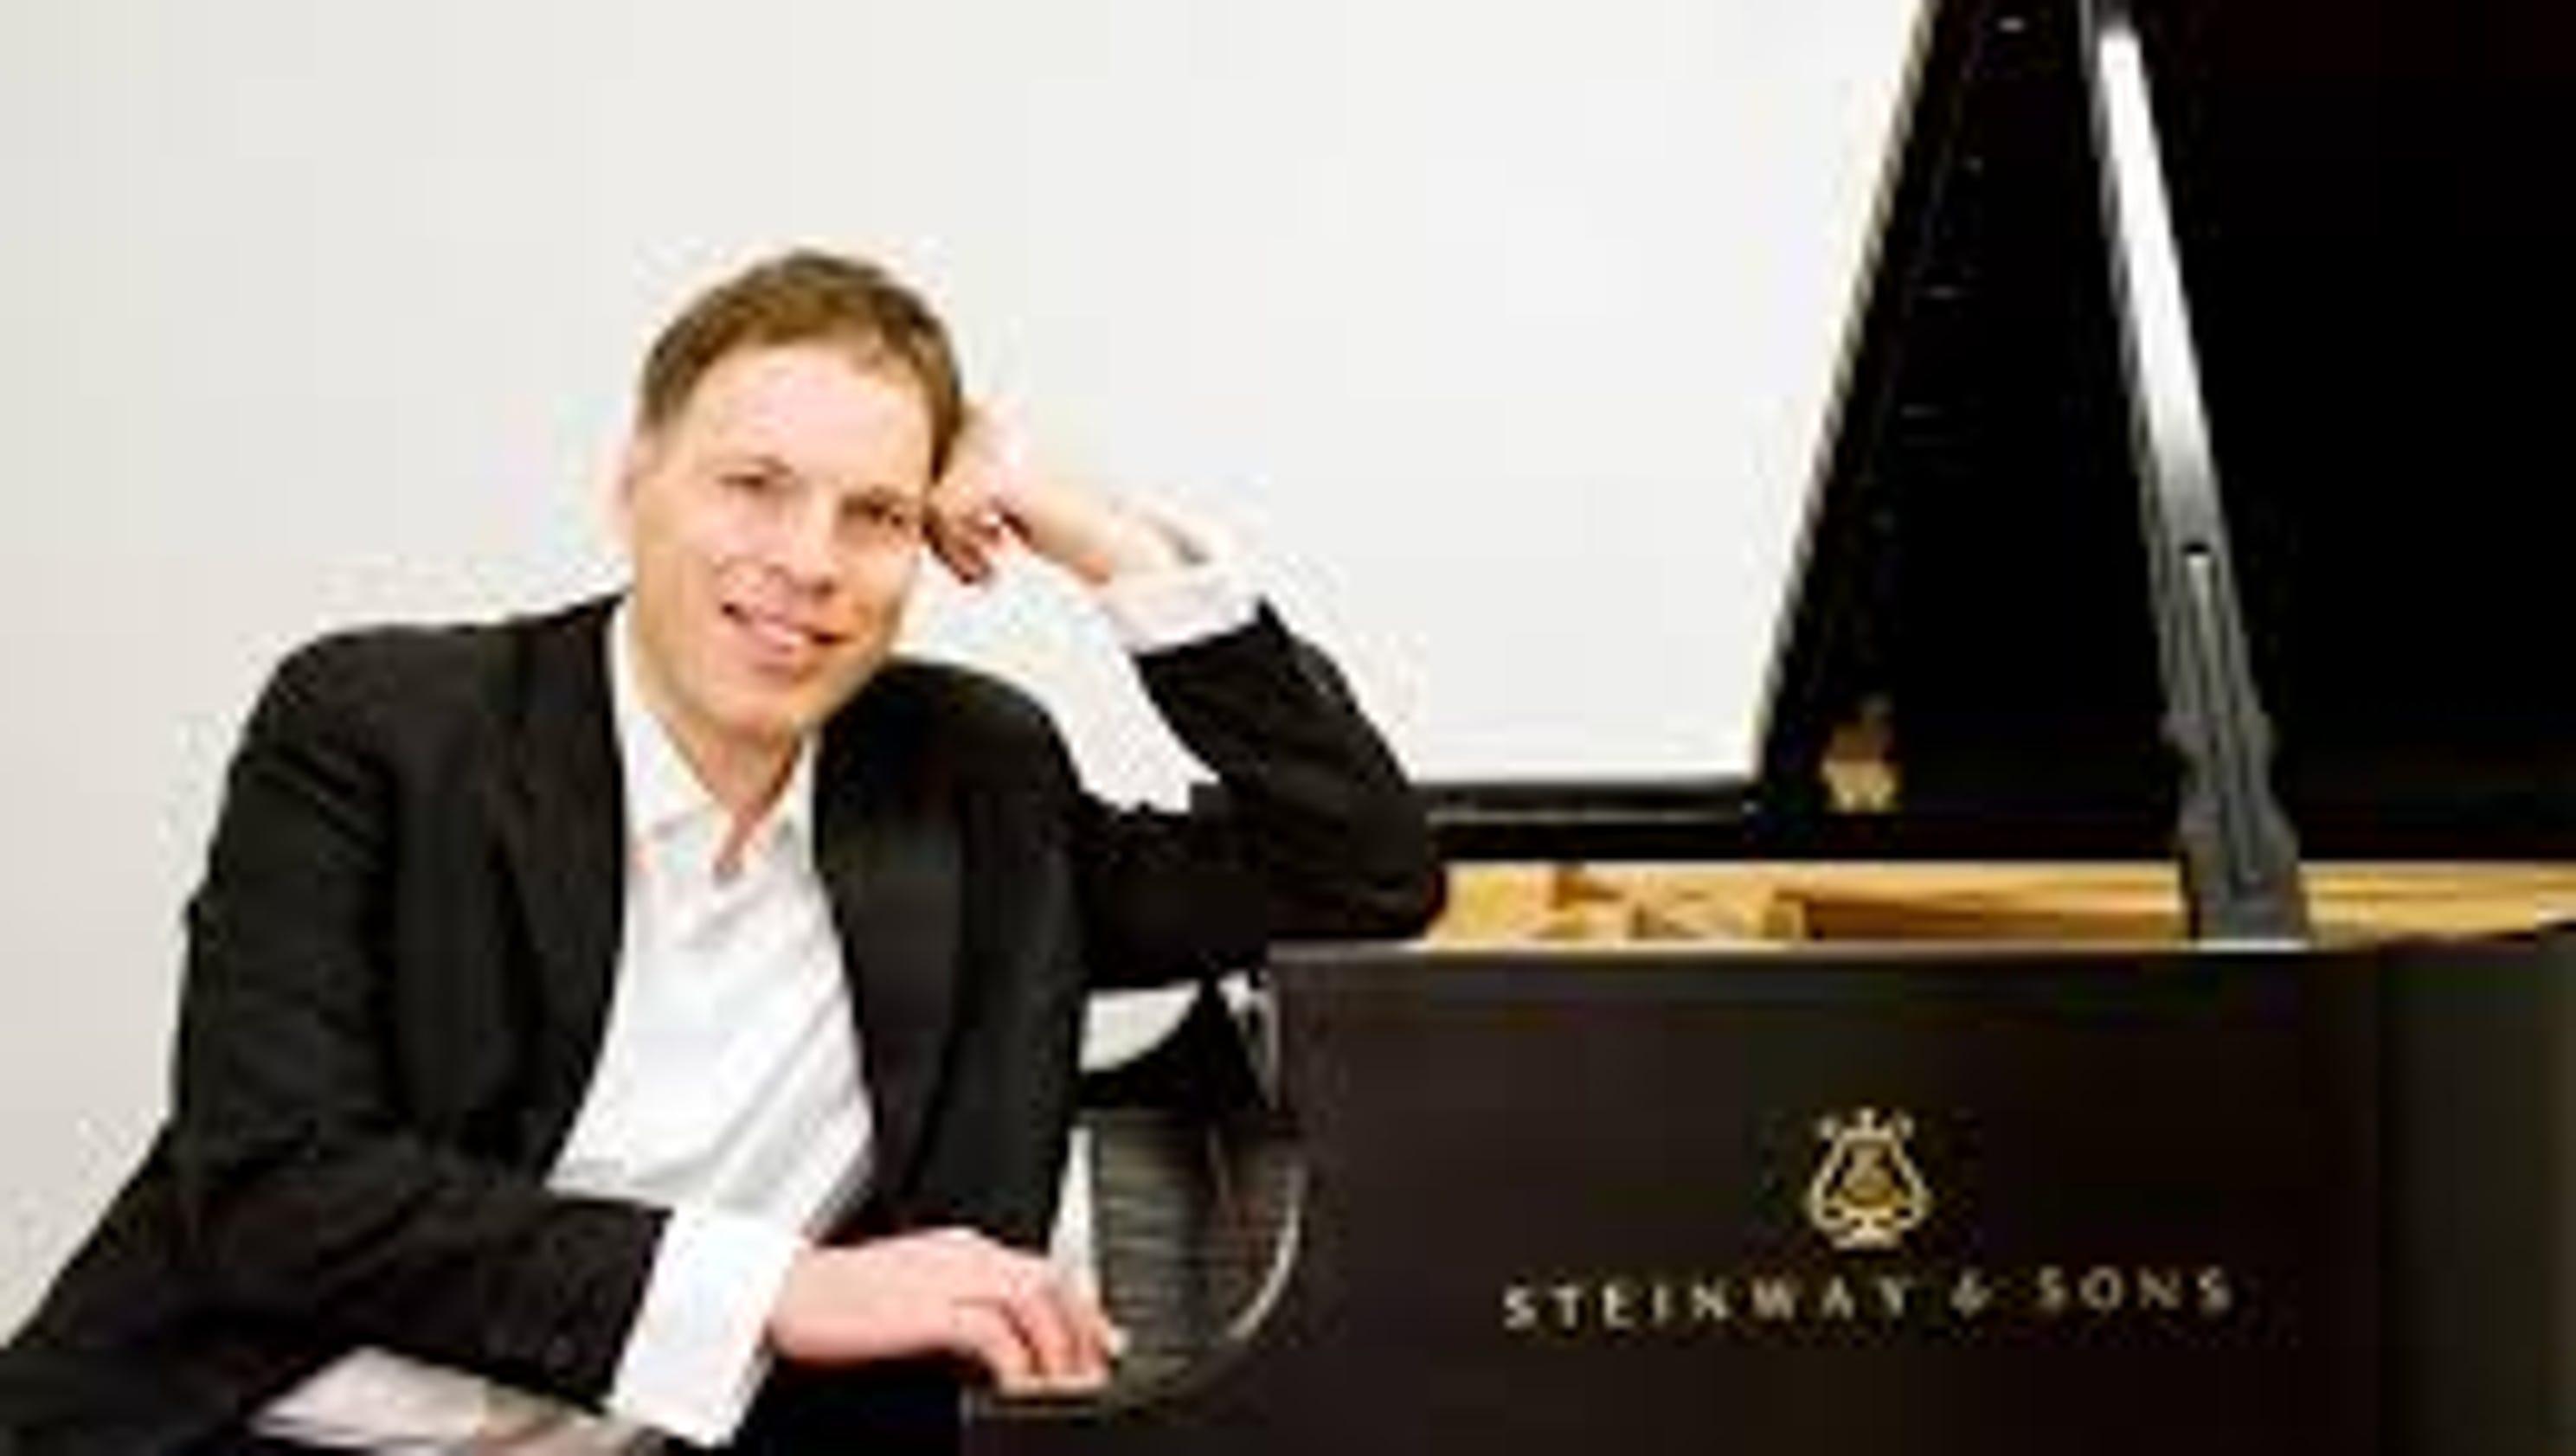 the pianist essay the pianist essay the pianist studiocanal  the pianist essay mona golabek in the pianist of willesden lane essay example mona golabek in